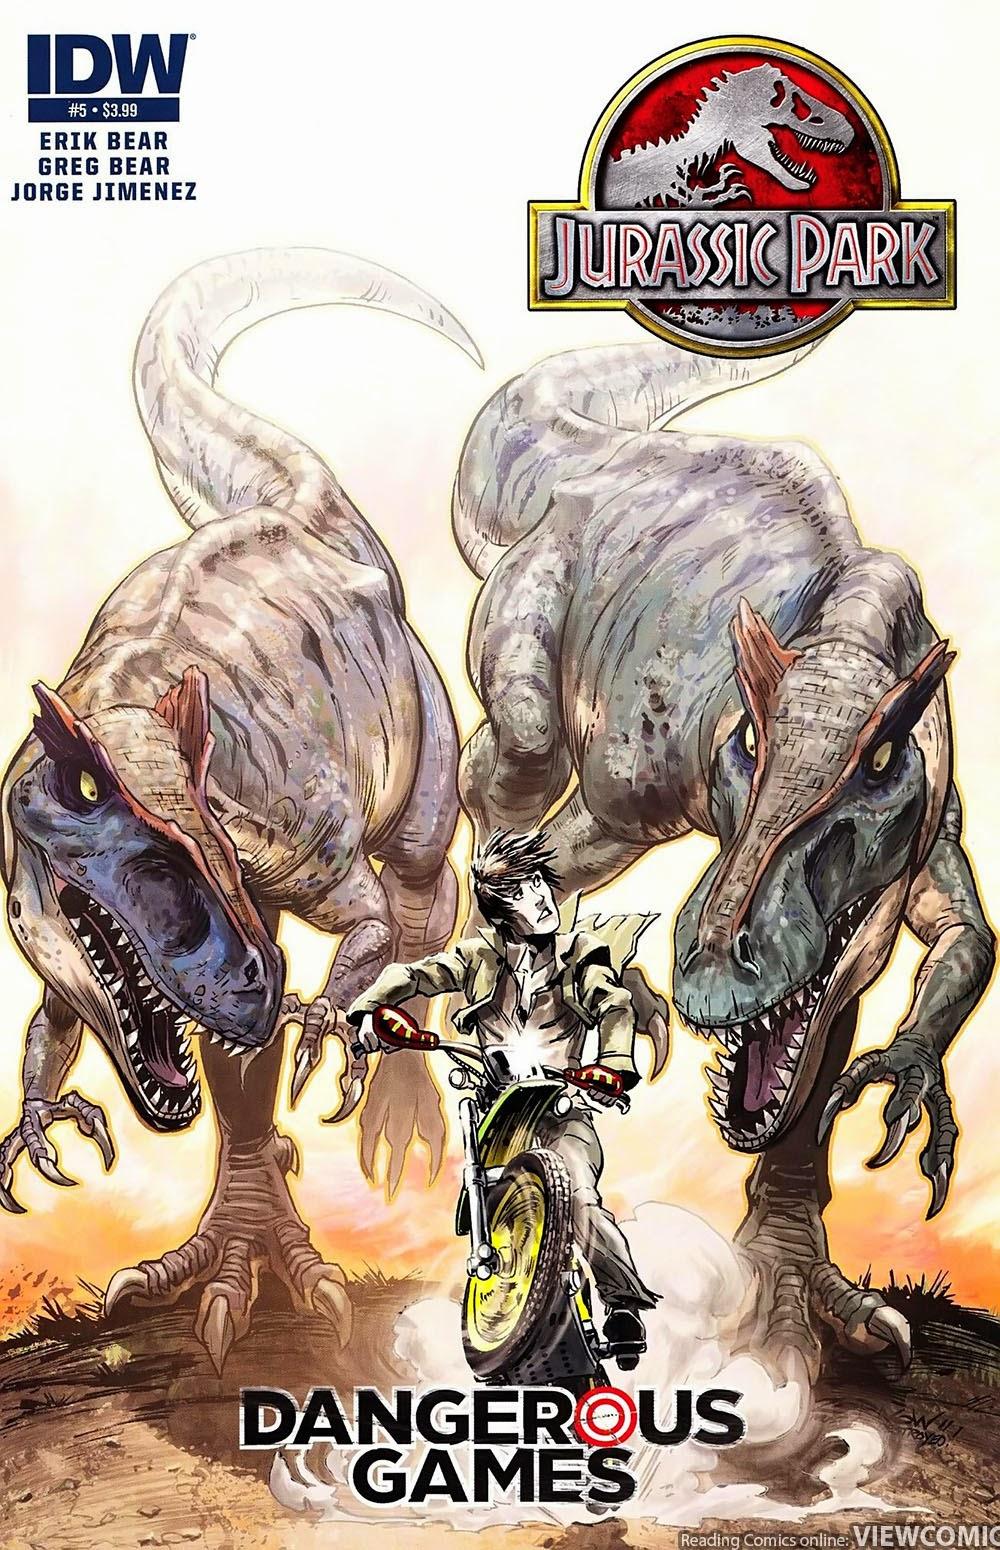 Jurassic Park | Viewcomic reading comics online for free 2019